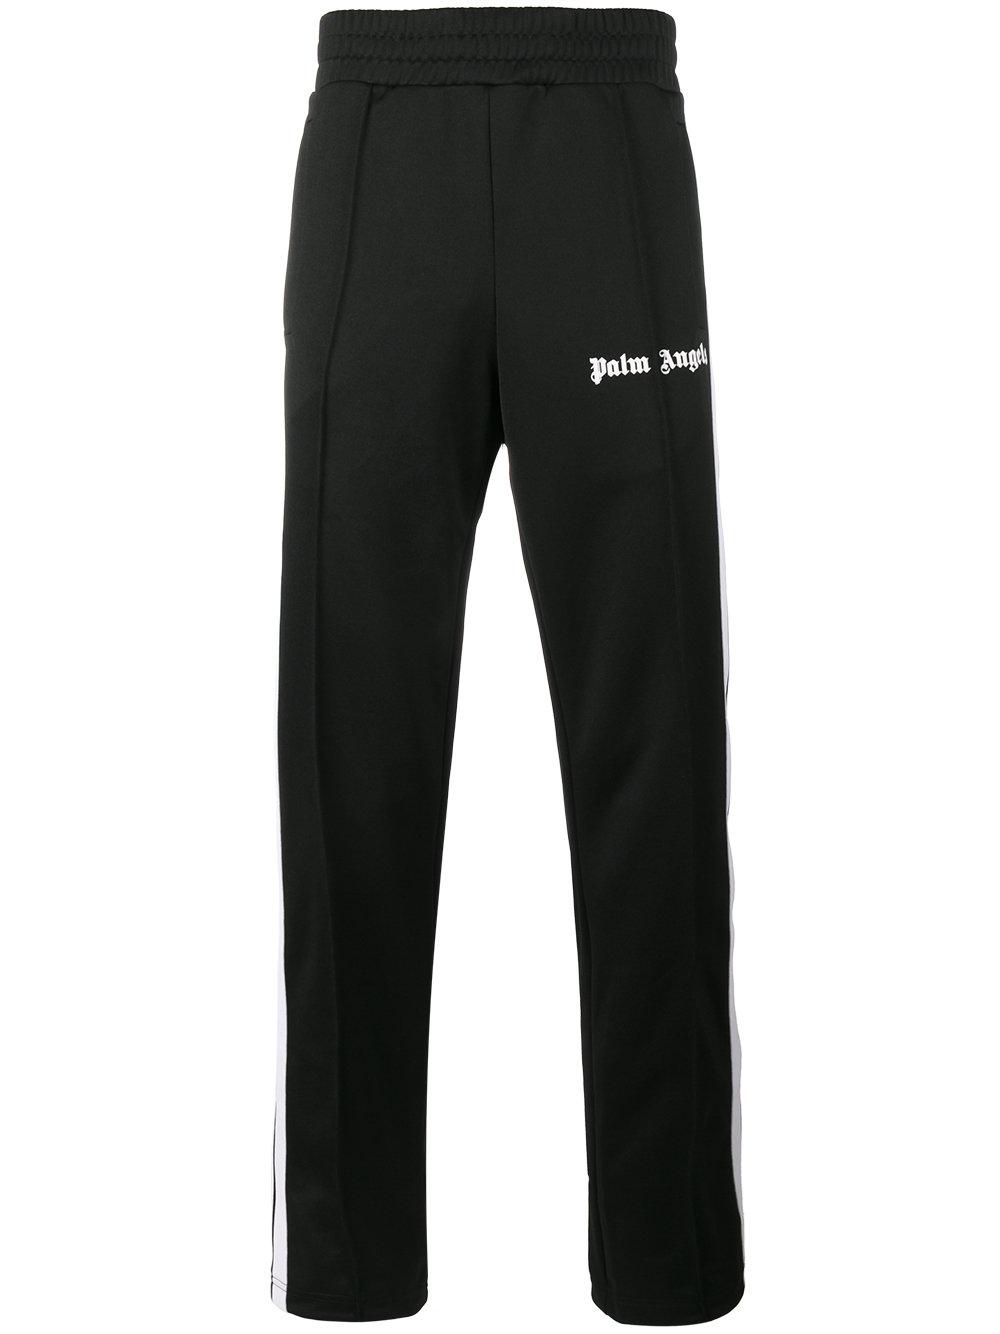 Palm Angels   Black Track Pant